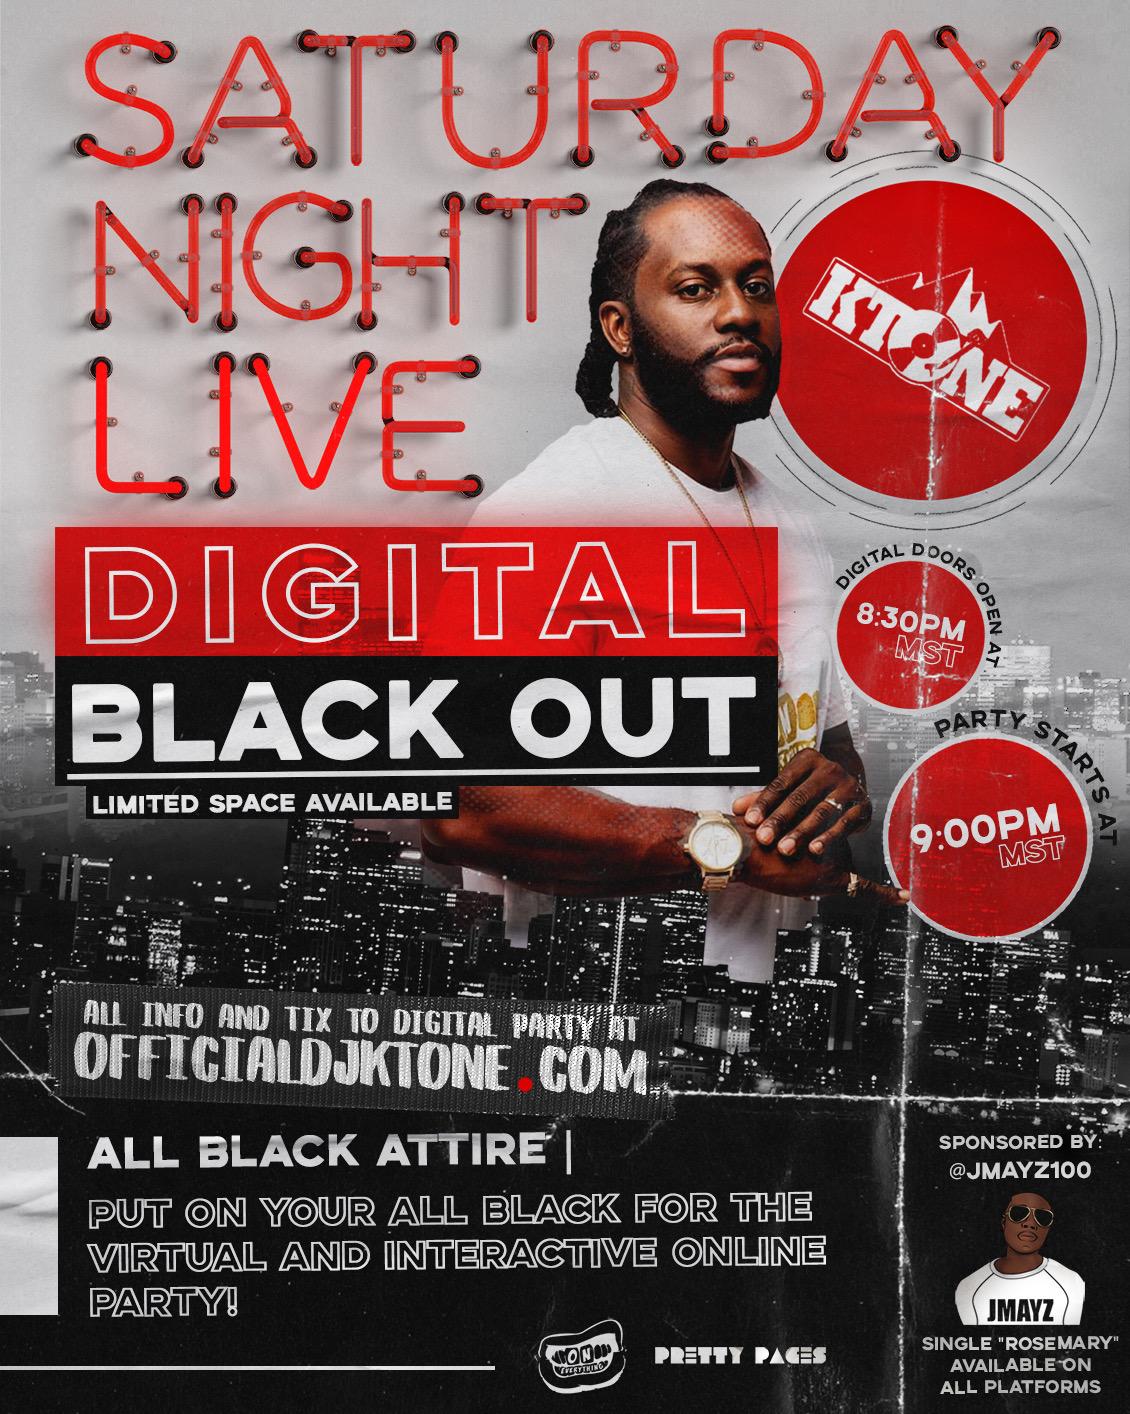 Saturday Night Live Digital Club - Digital Blackout Party April 2020